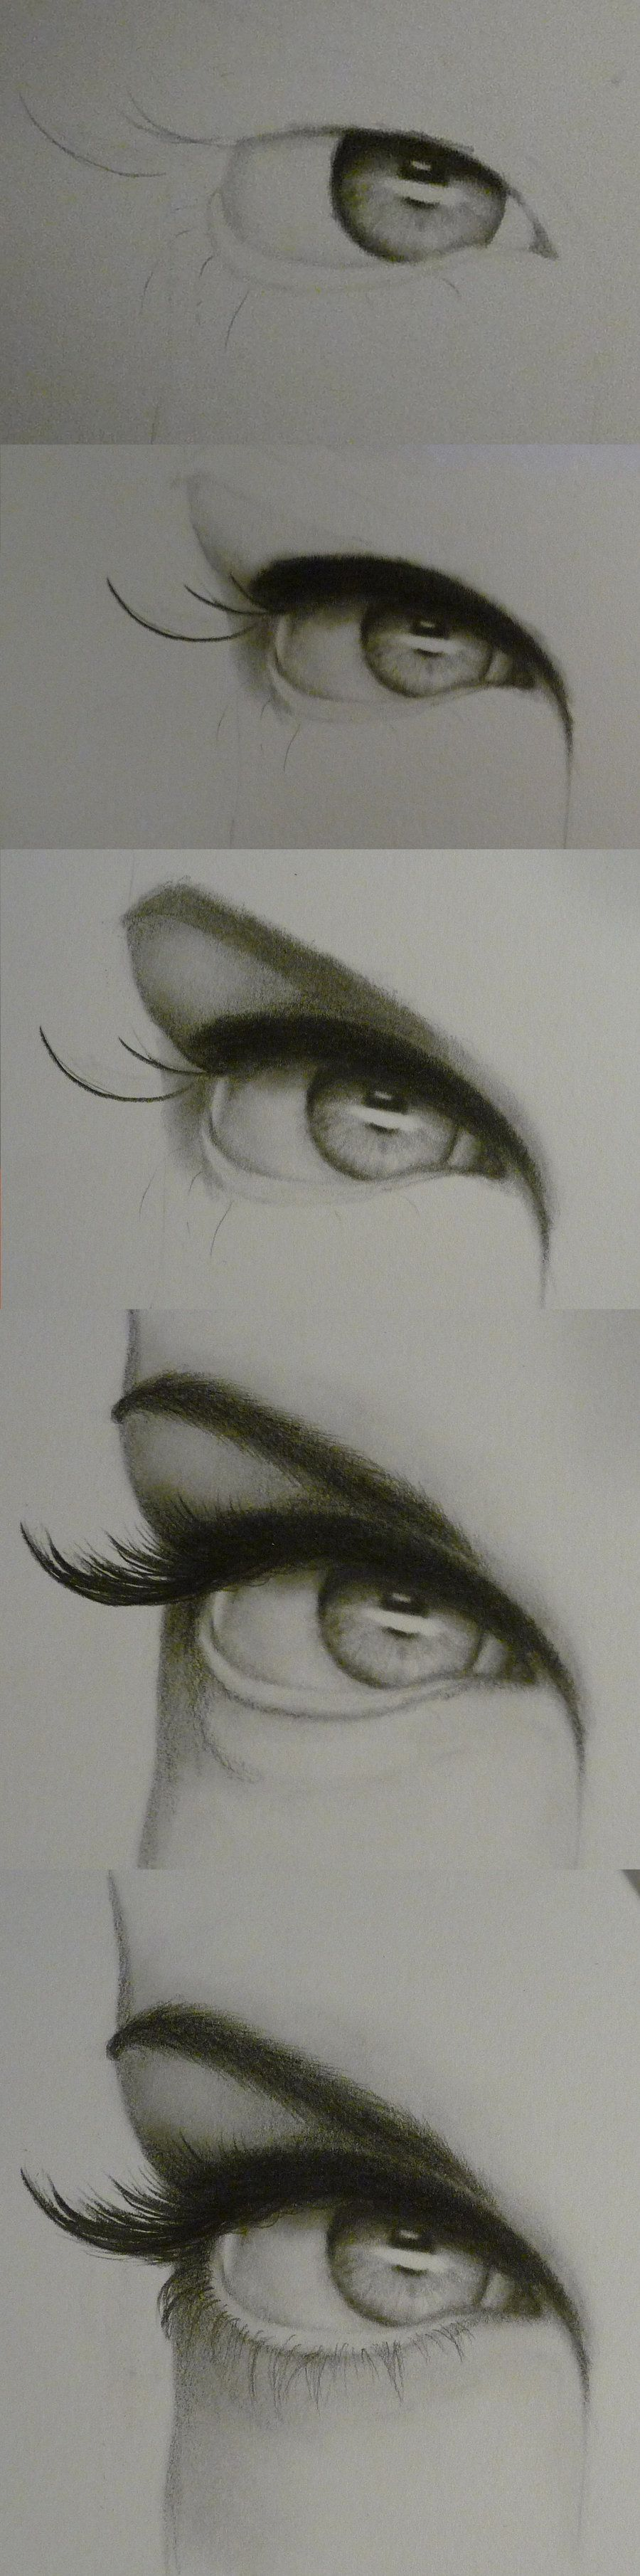 Eye Progression by ~lovedolphins10409 on deviantART